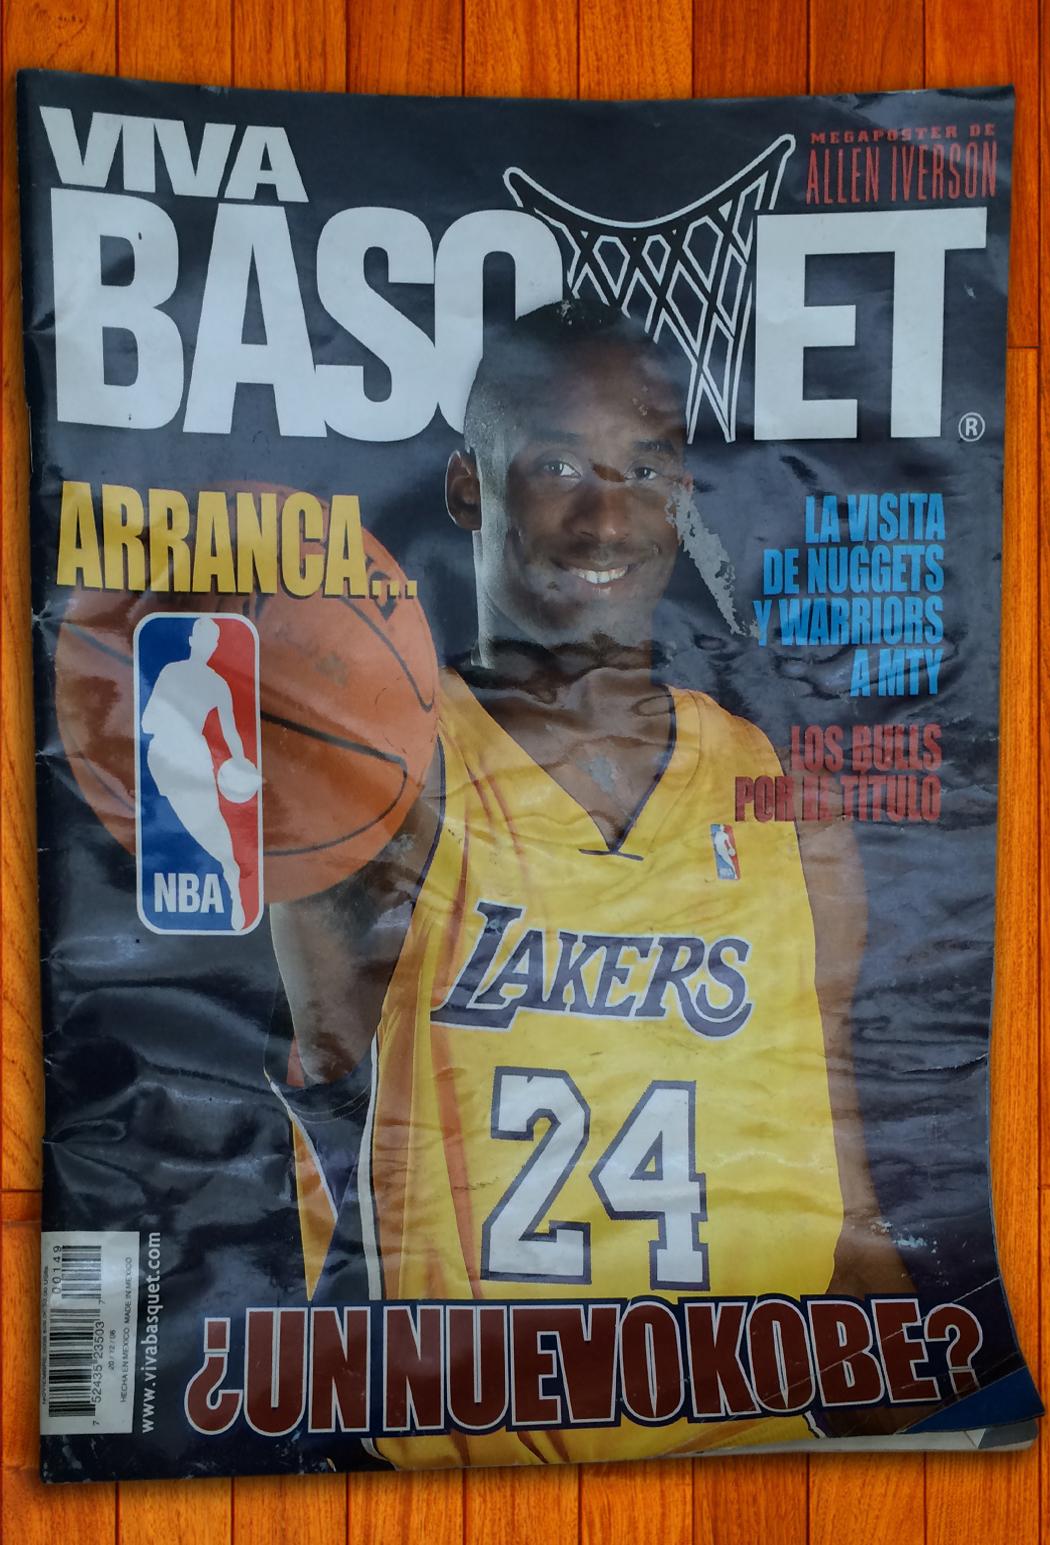 Kobe Bryant en viva basquet foto 1